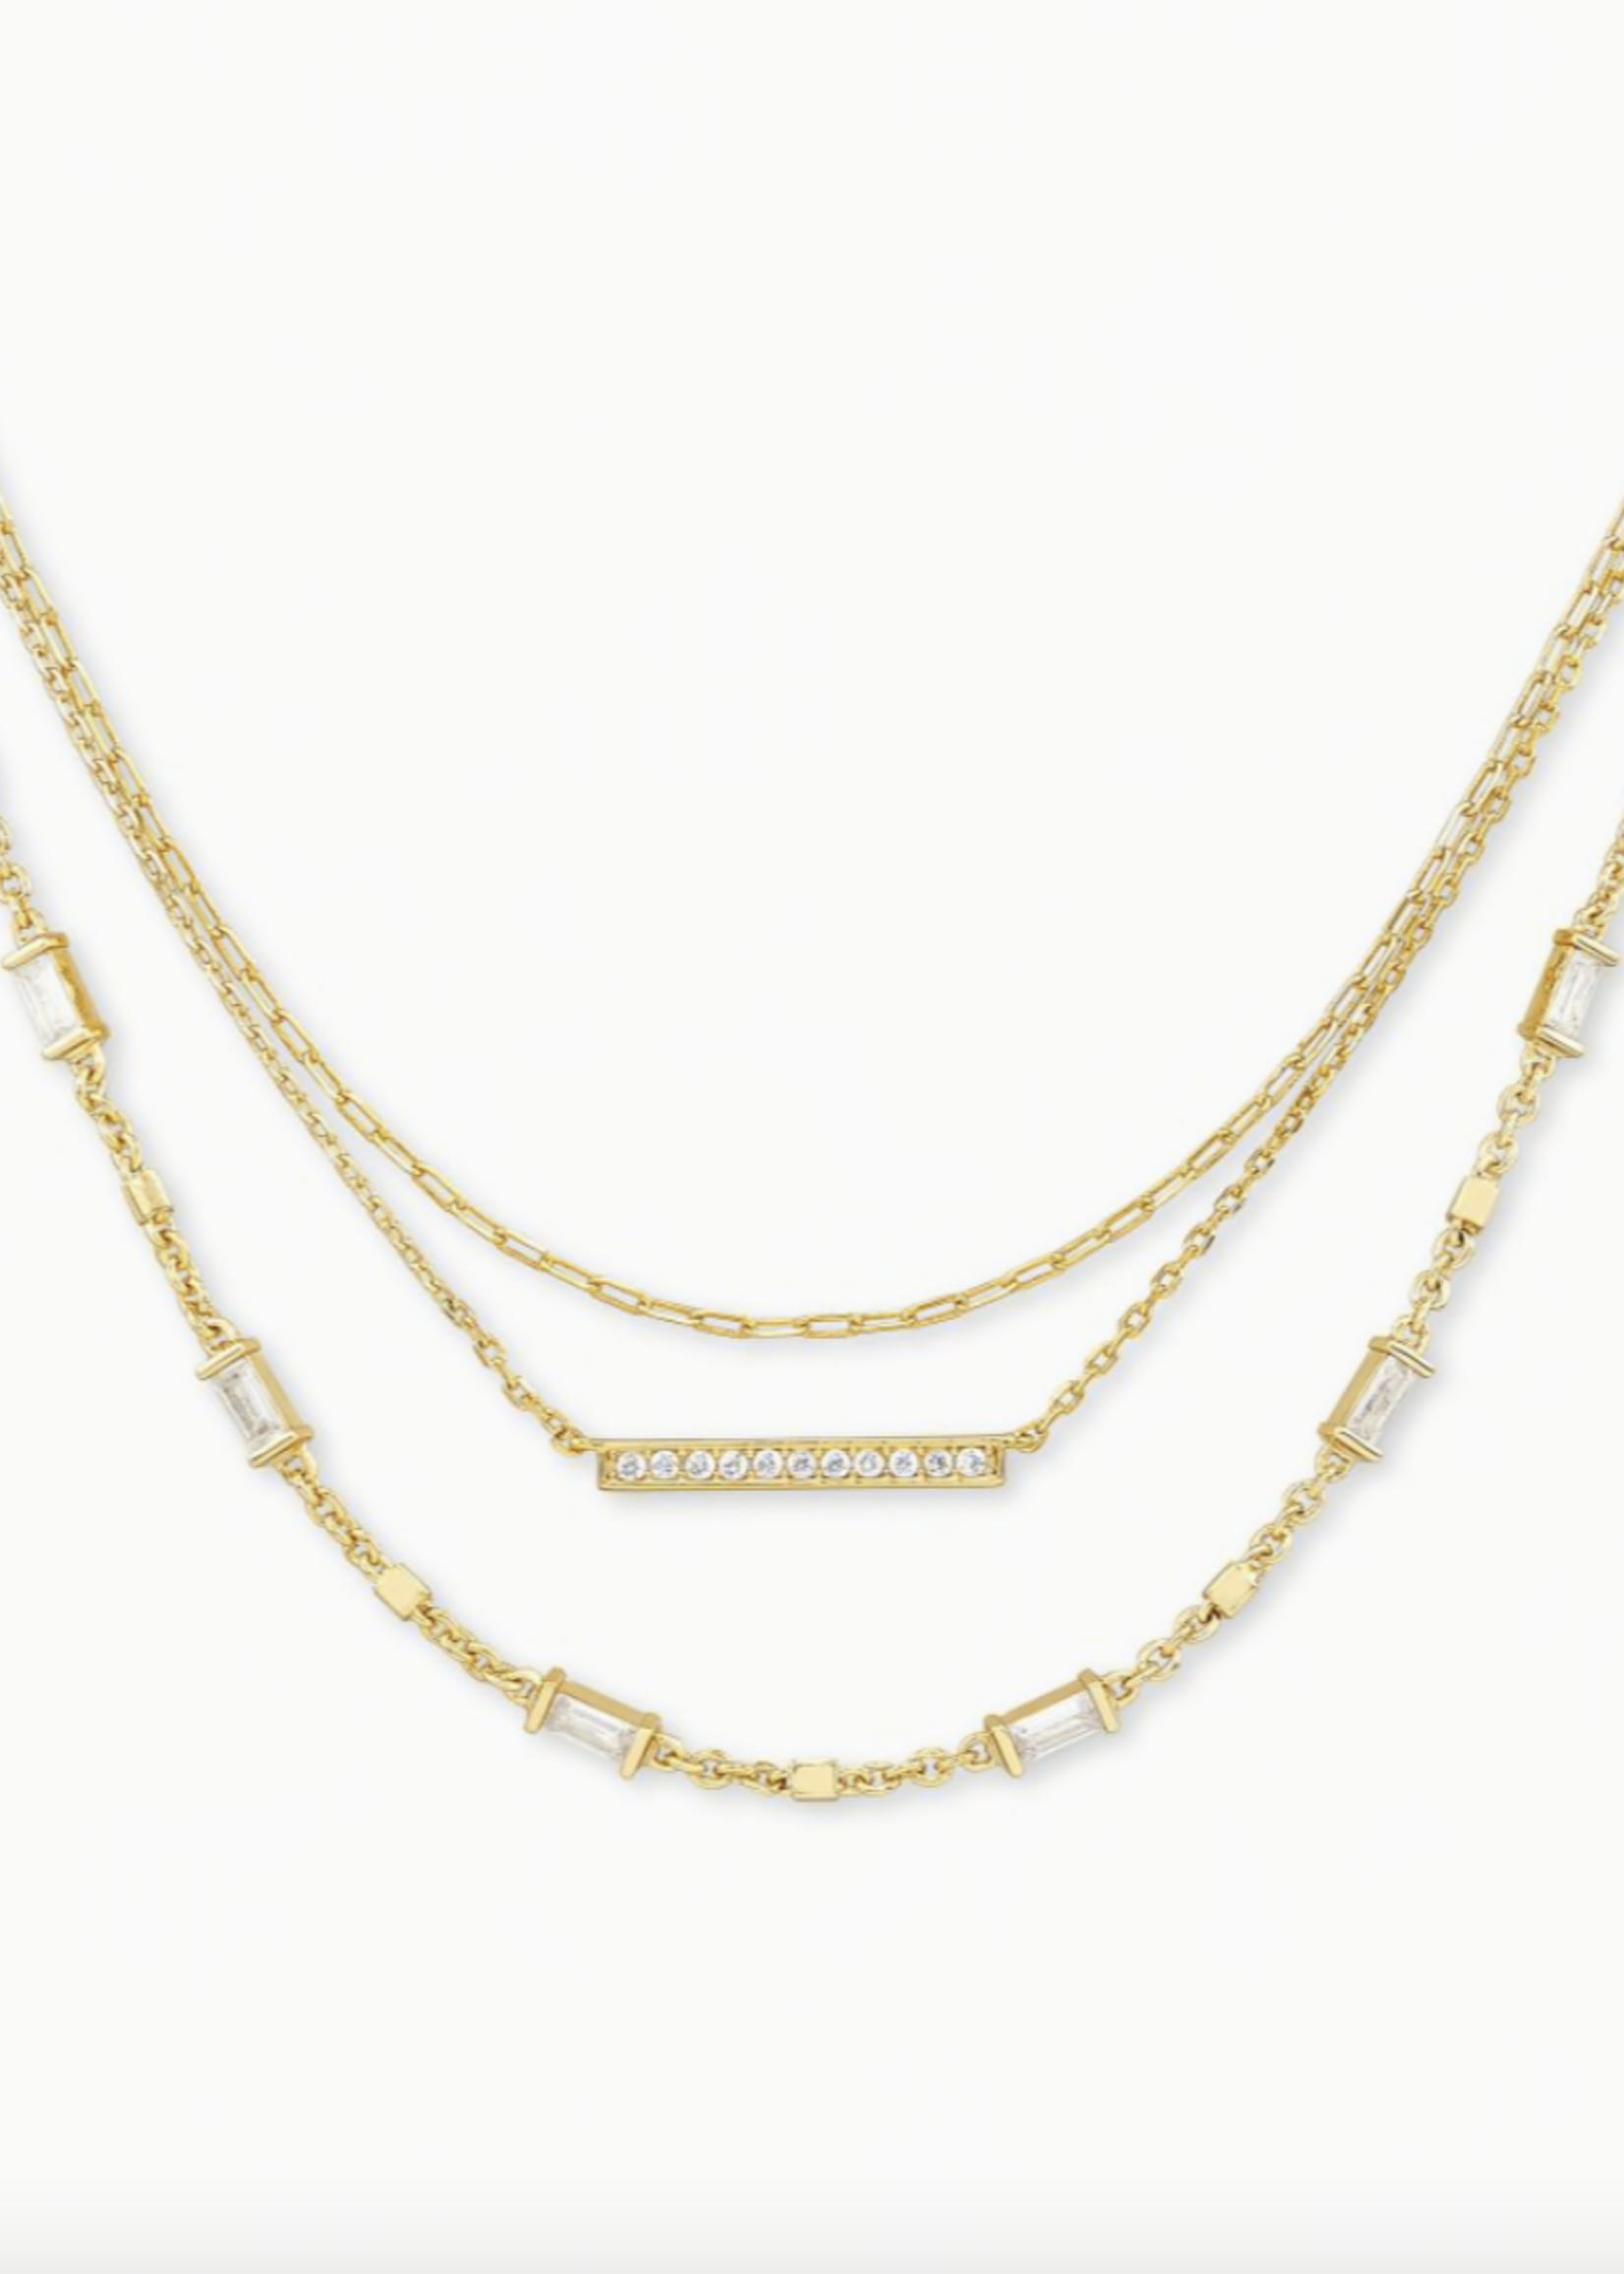 Kendra Scott Kendra Scott Addison Multi Strand Necklace Gold